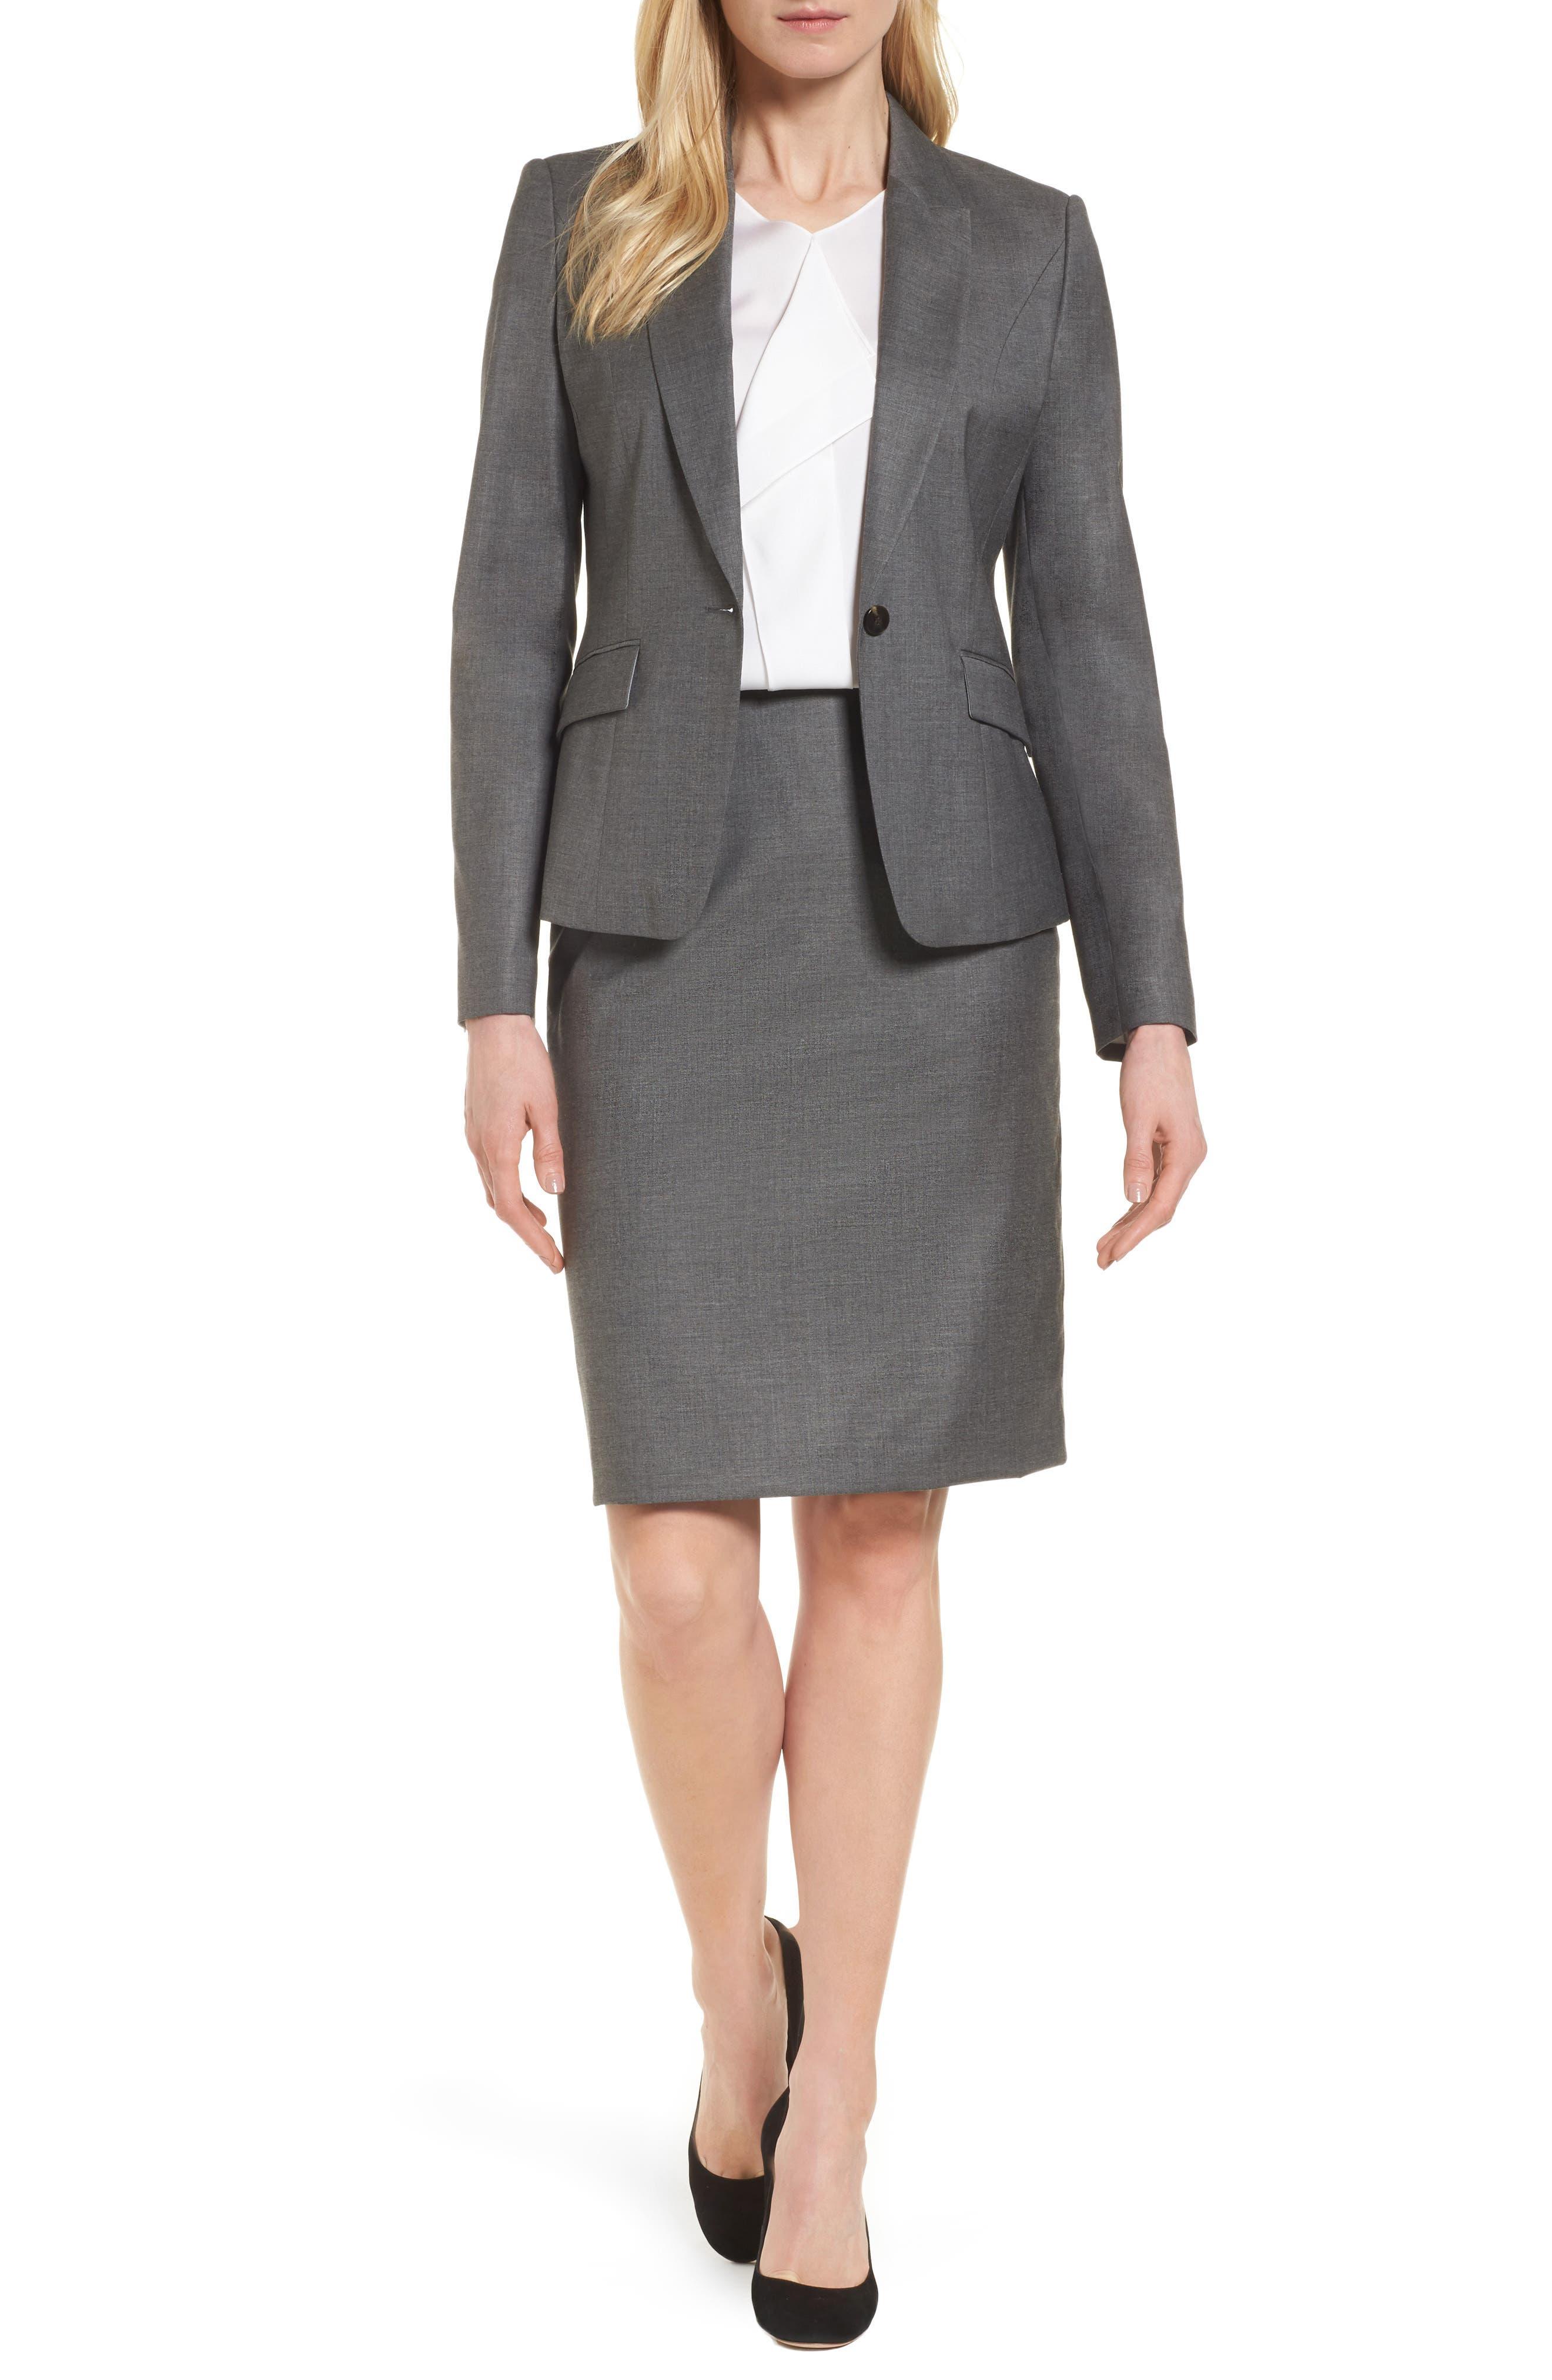 Vileana Wool Blend Suit Skirt,                             Alternate thumbnail 7, color,                             020